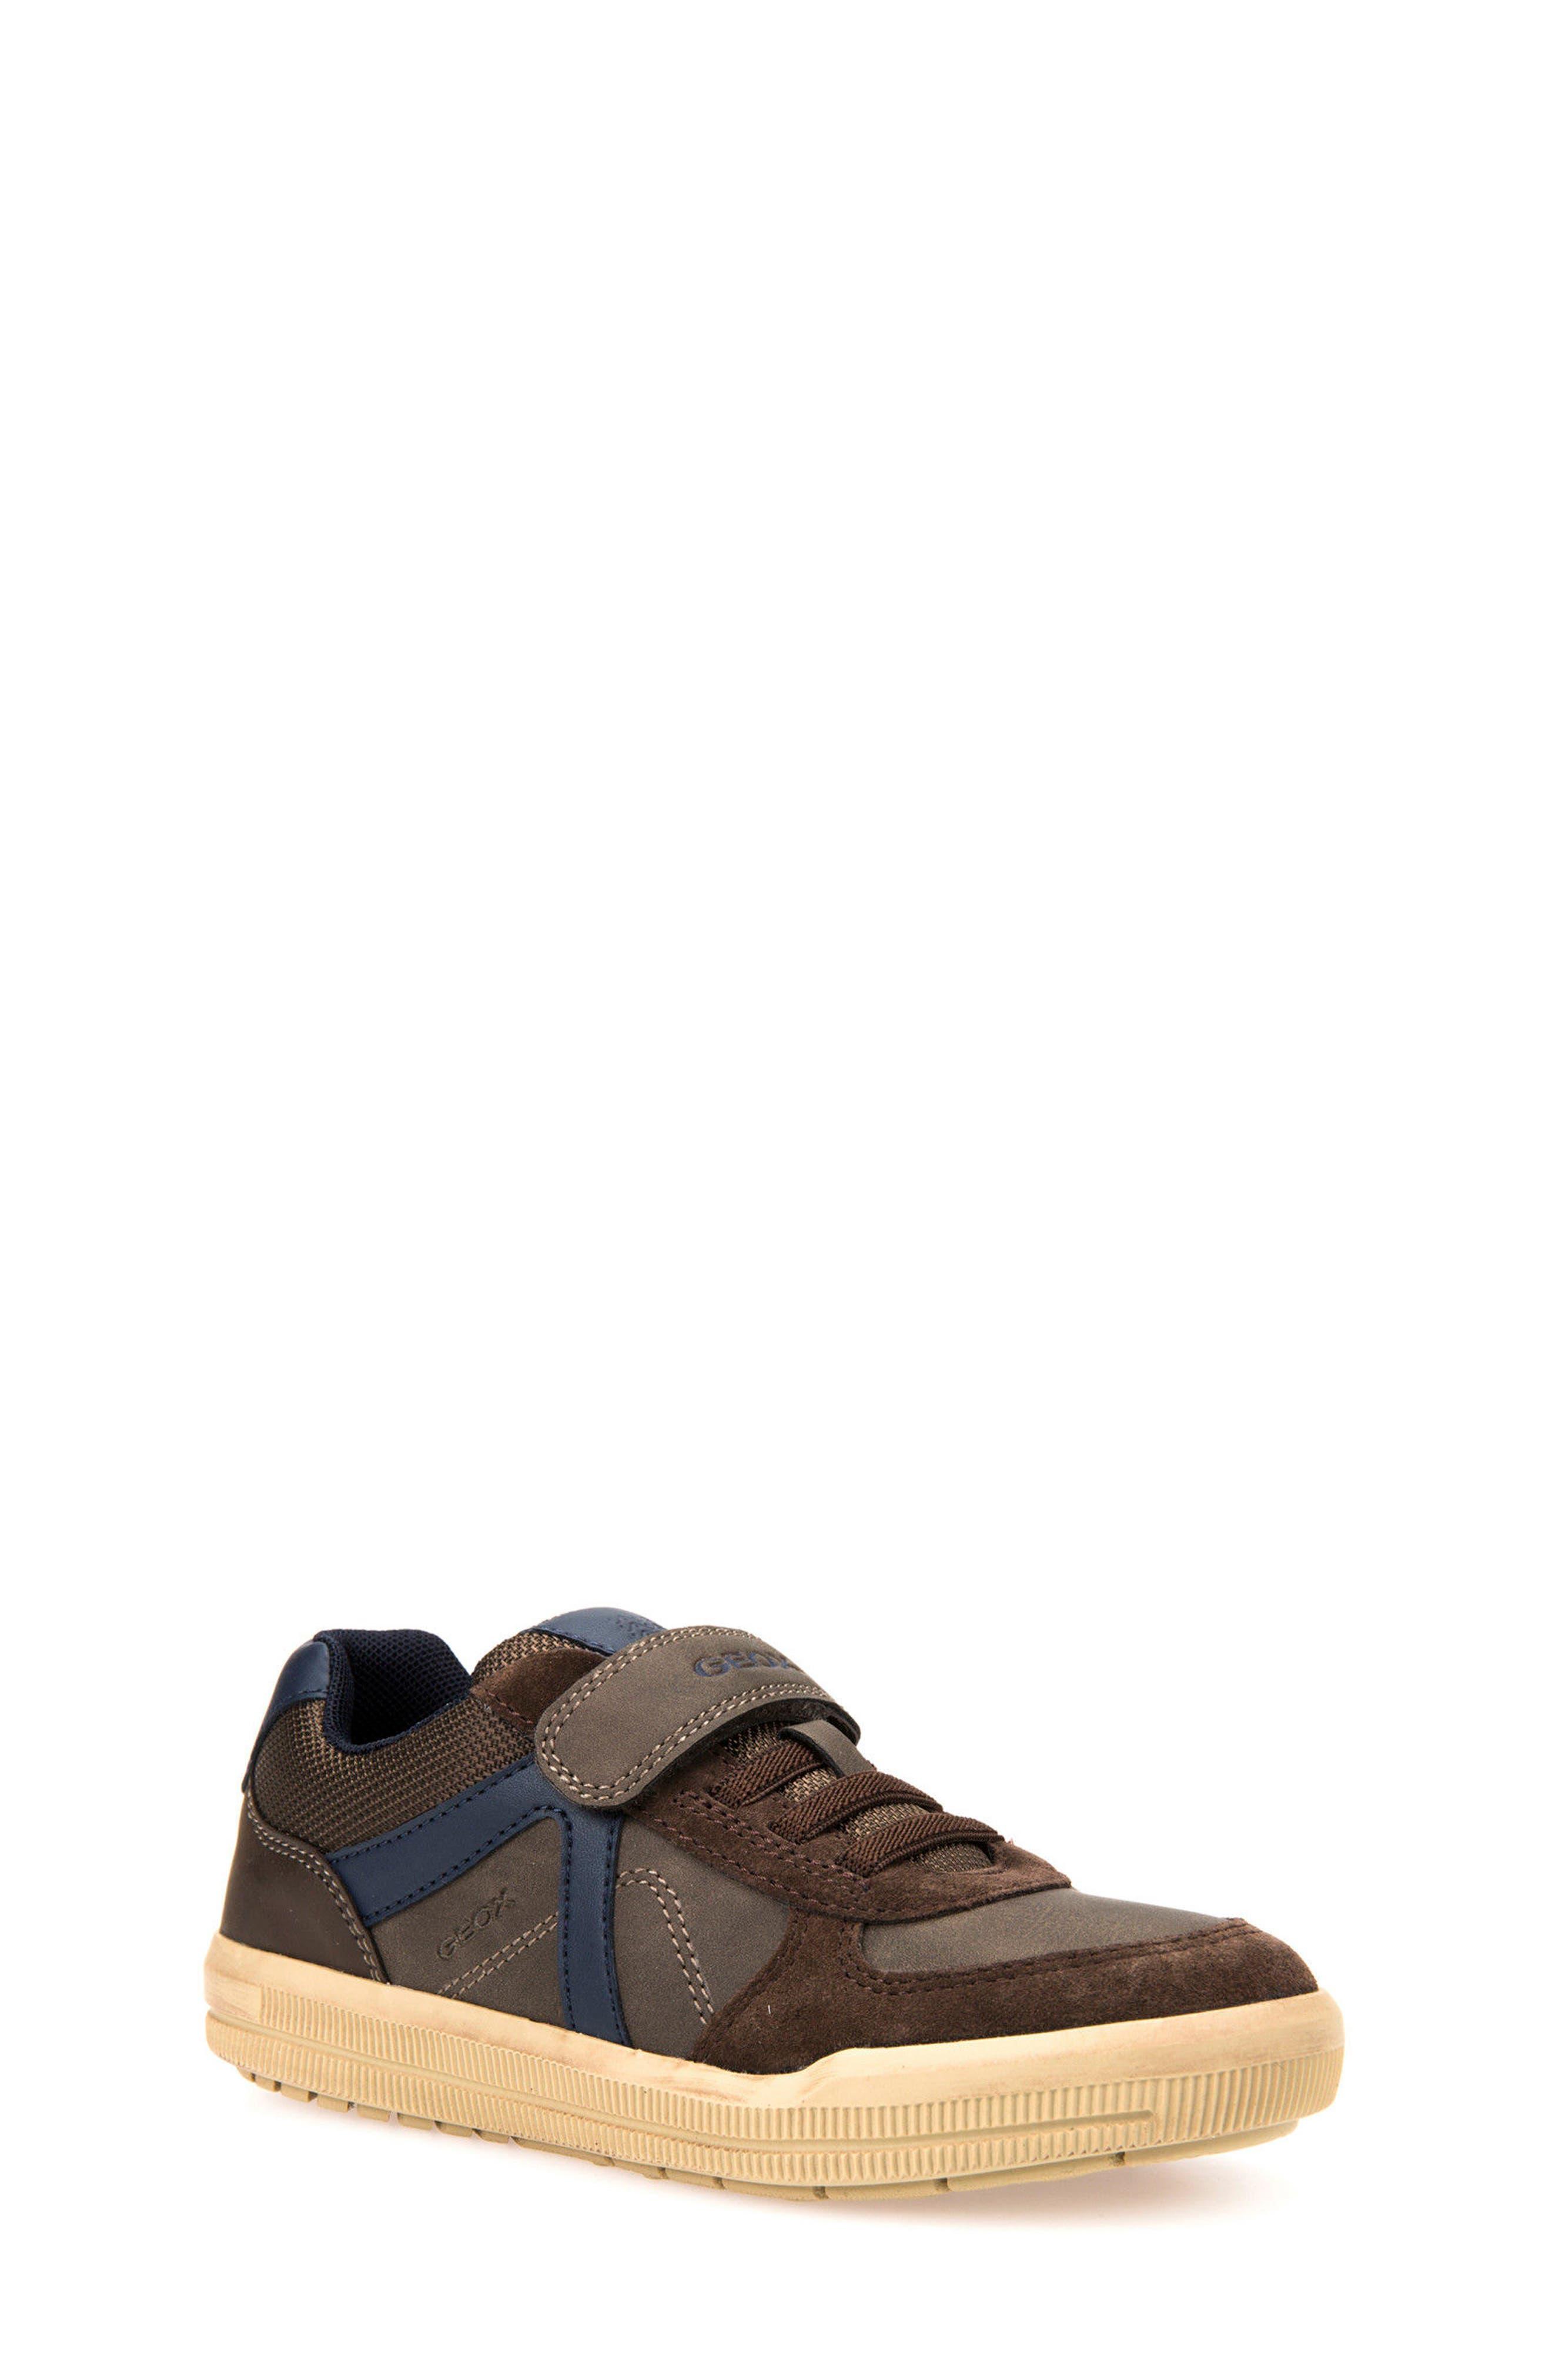 Geox Arzach Low Top Sneaker (Toddler, Little Kid & Big Kid)